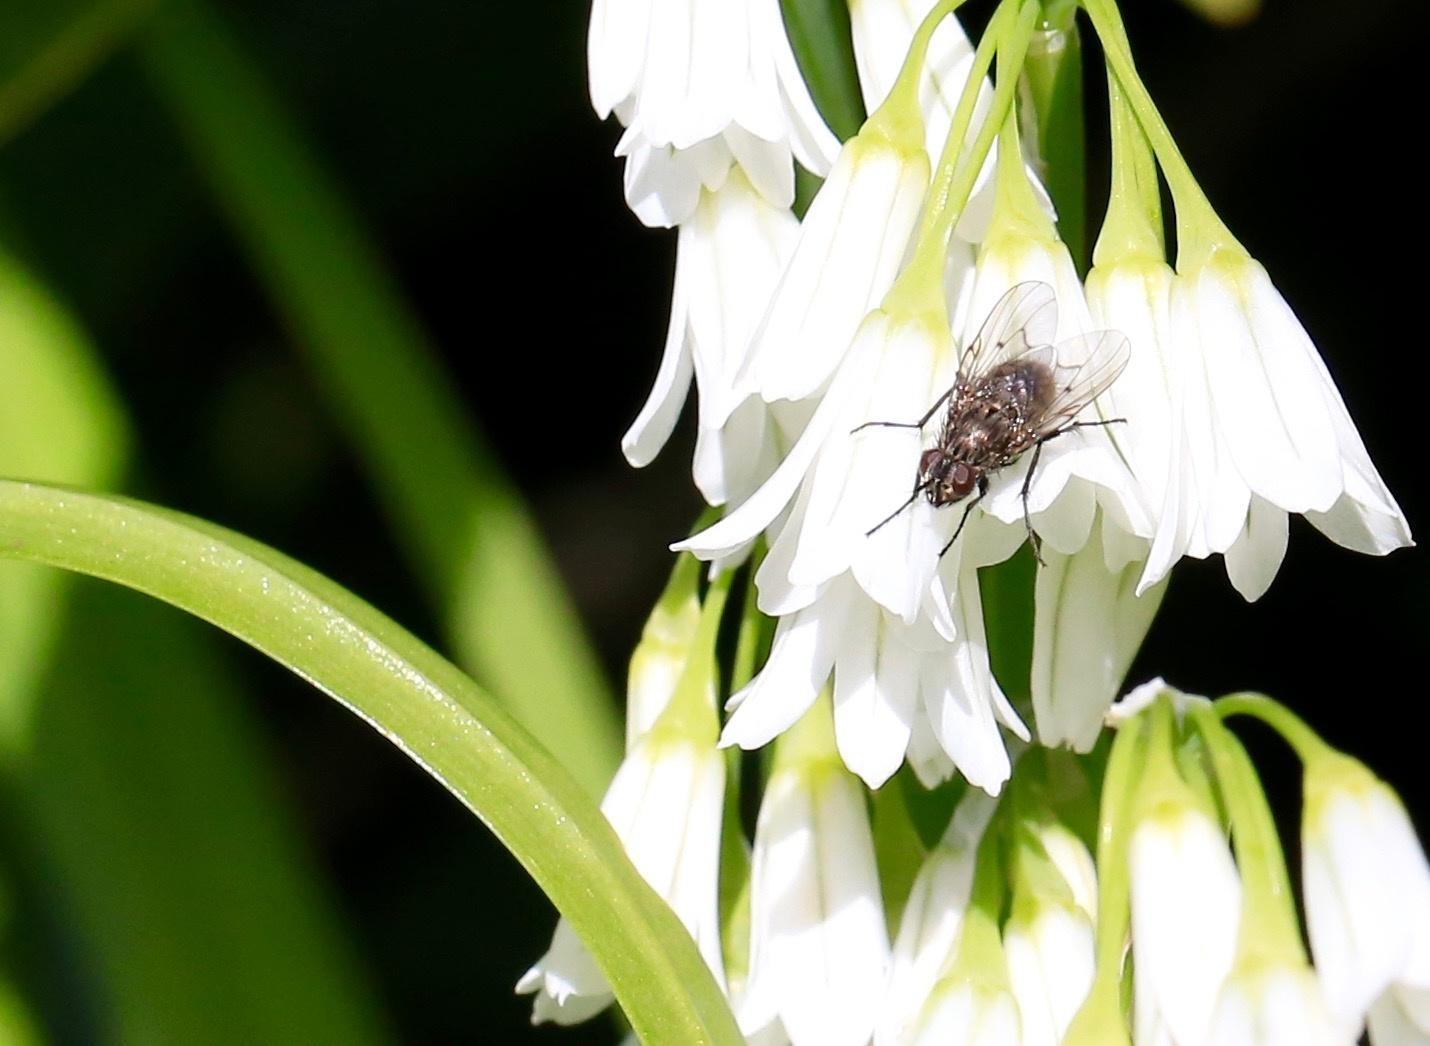 Spring garlic and fly by gaffer.lyons